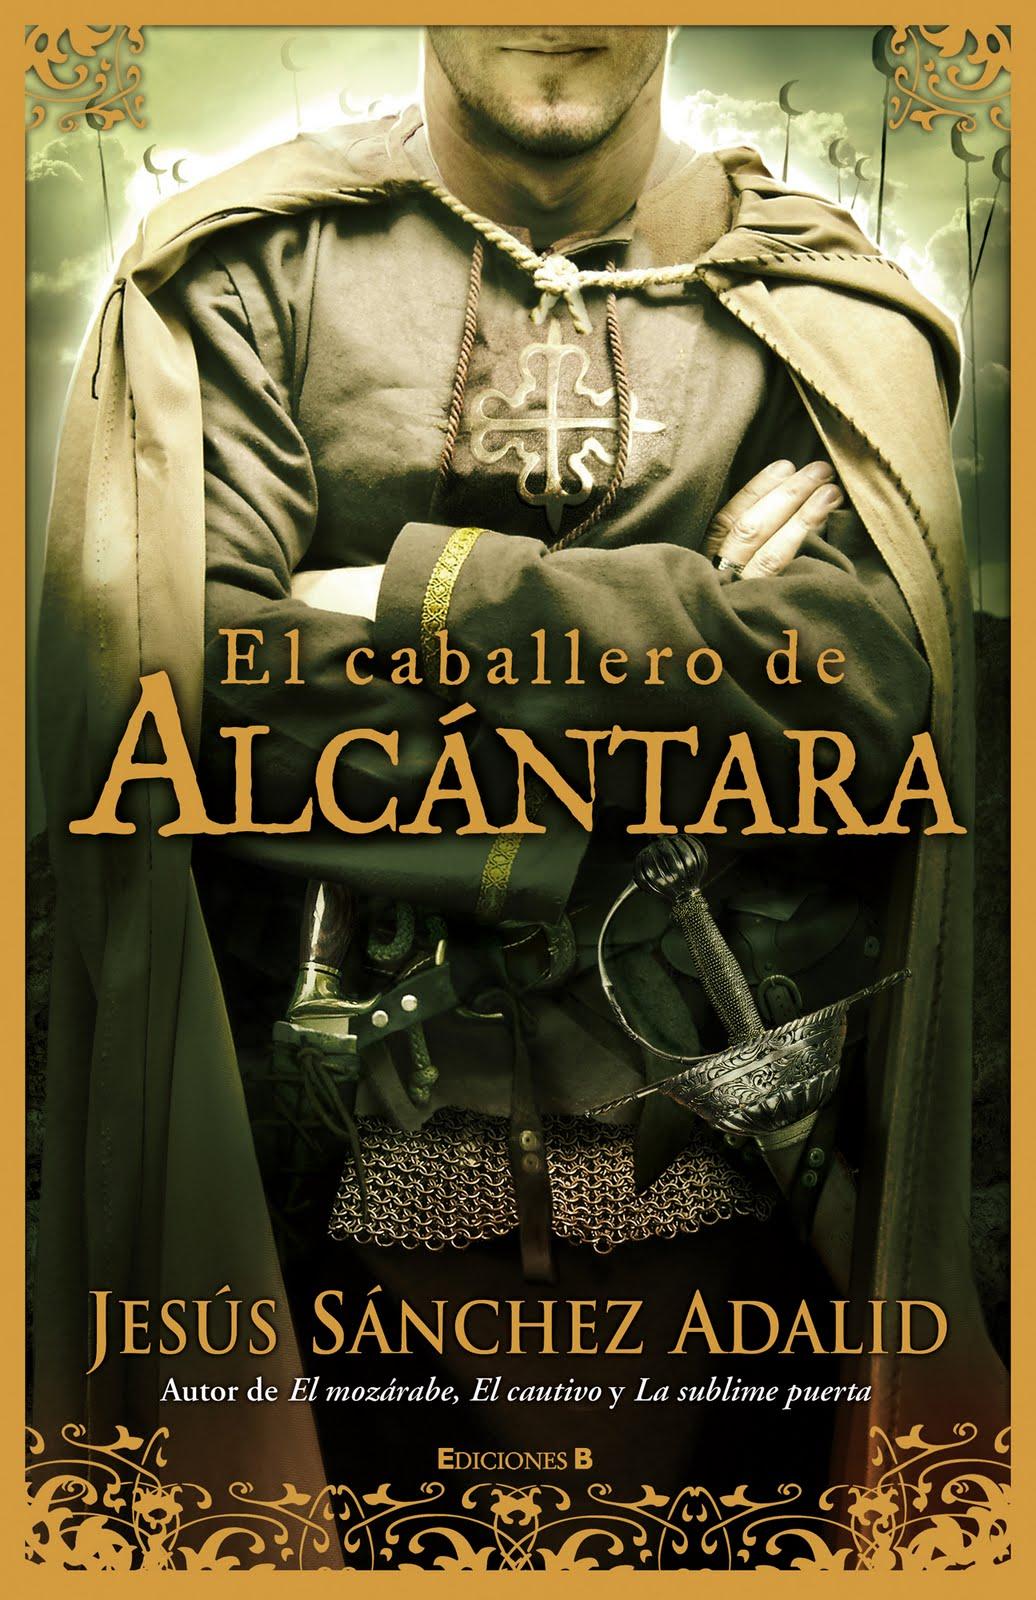 https://i0.wp.com/2.bp.blogspot.com/_CoBOcC_pla4/TBT8jxXMKMI/AAAAAAAAAeM/o3AkAGeL5pM/s1600/El+caballero+de+Alcantara.jpg?resize=242%2C324